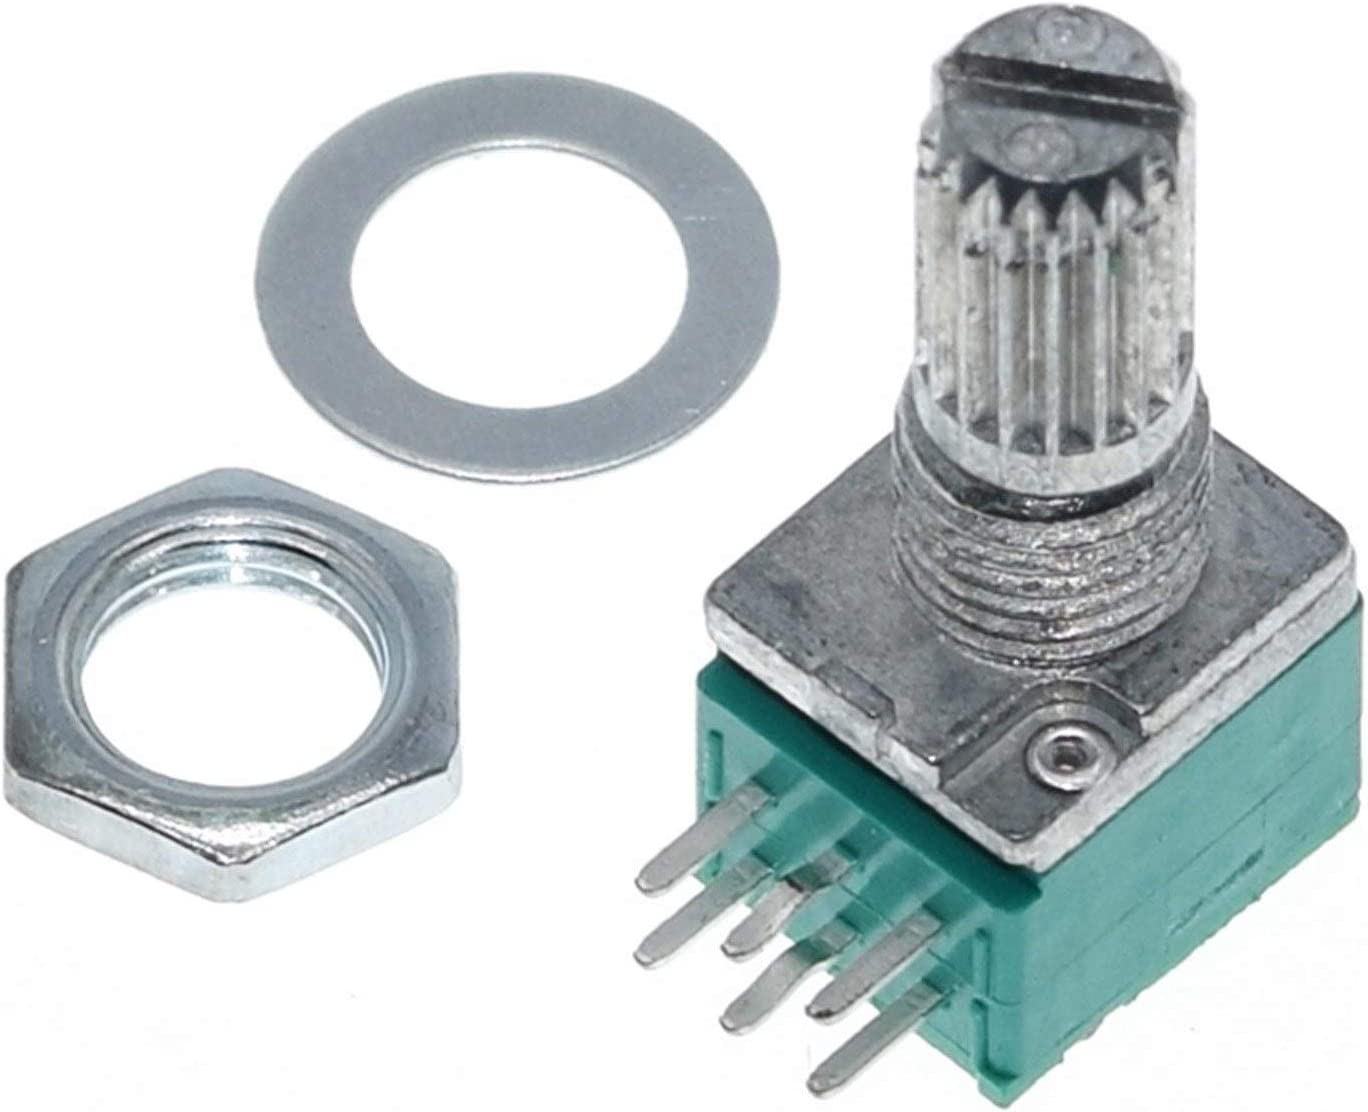 ZHENXKJ Potentiometer Outlet sale unisex feature 1PCS 6pins RK097N B10K B100K B5K B20K B50K